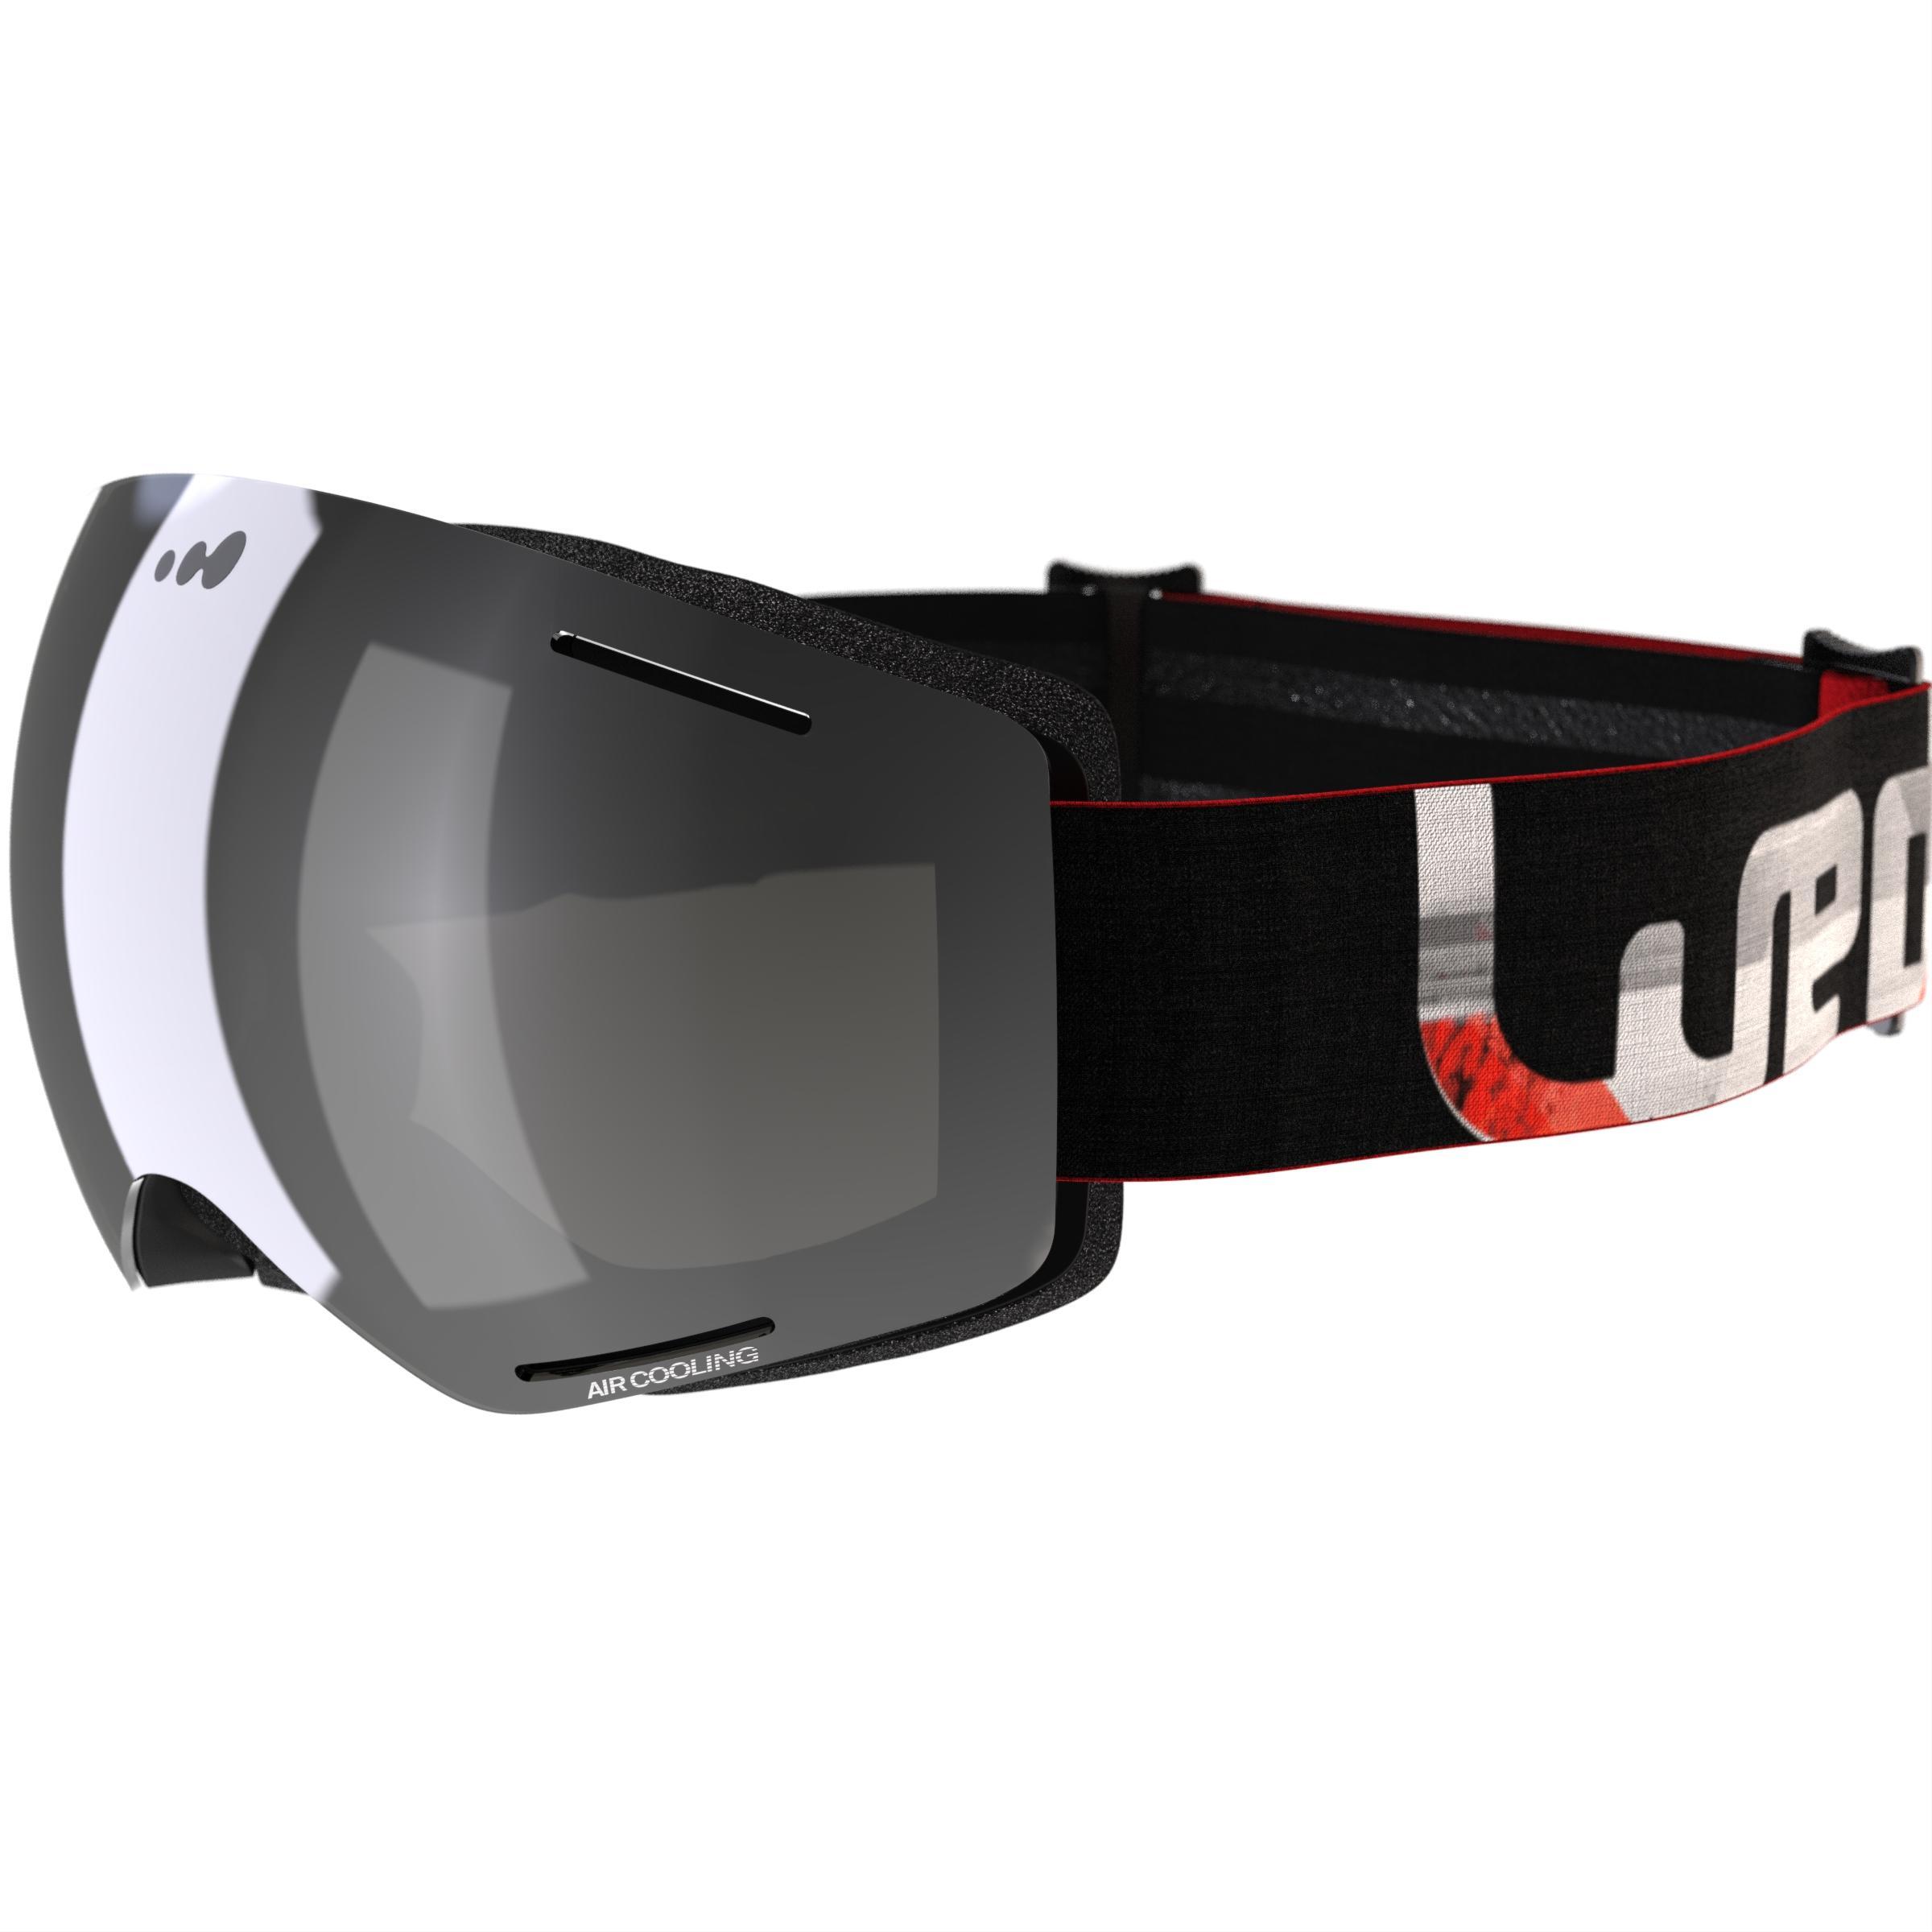 Wed'ze Ski- en snowboardbril G-View 600 zonnig weer 2018 thumbnail